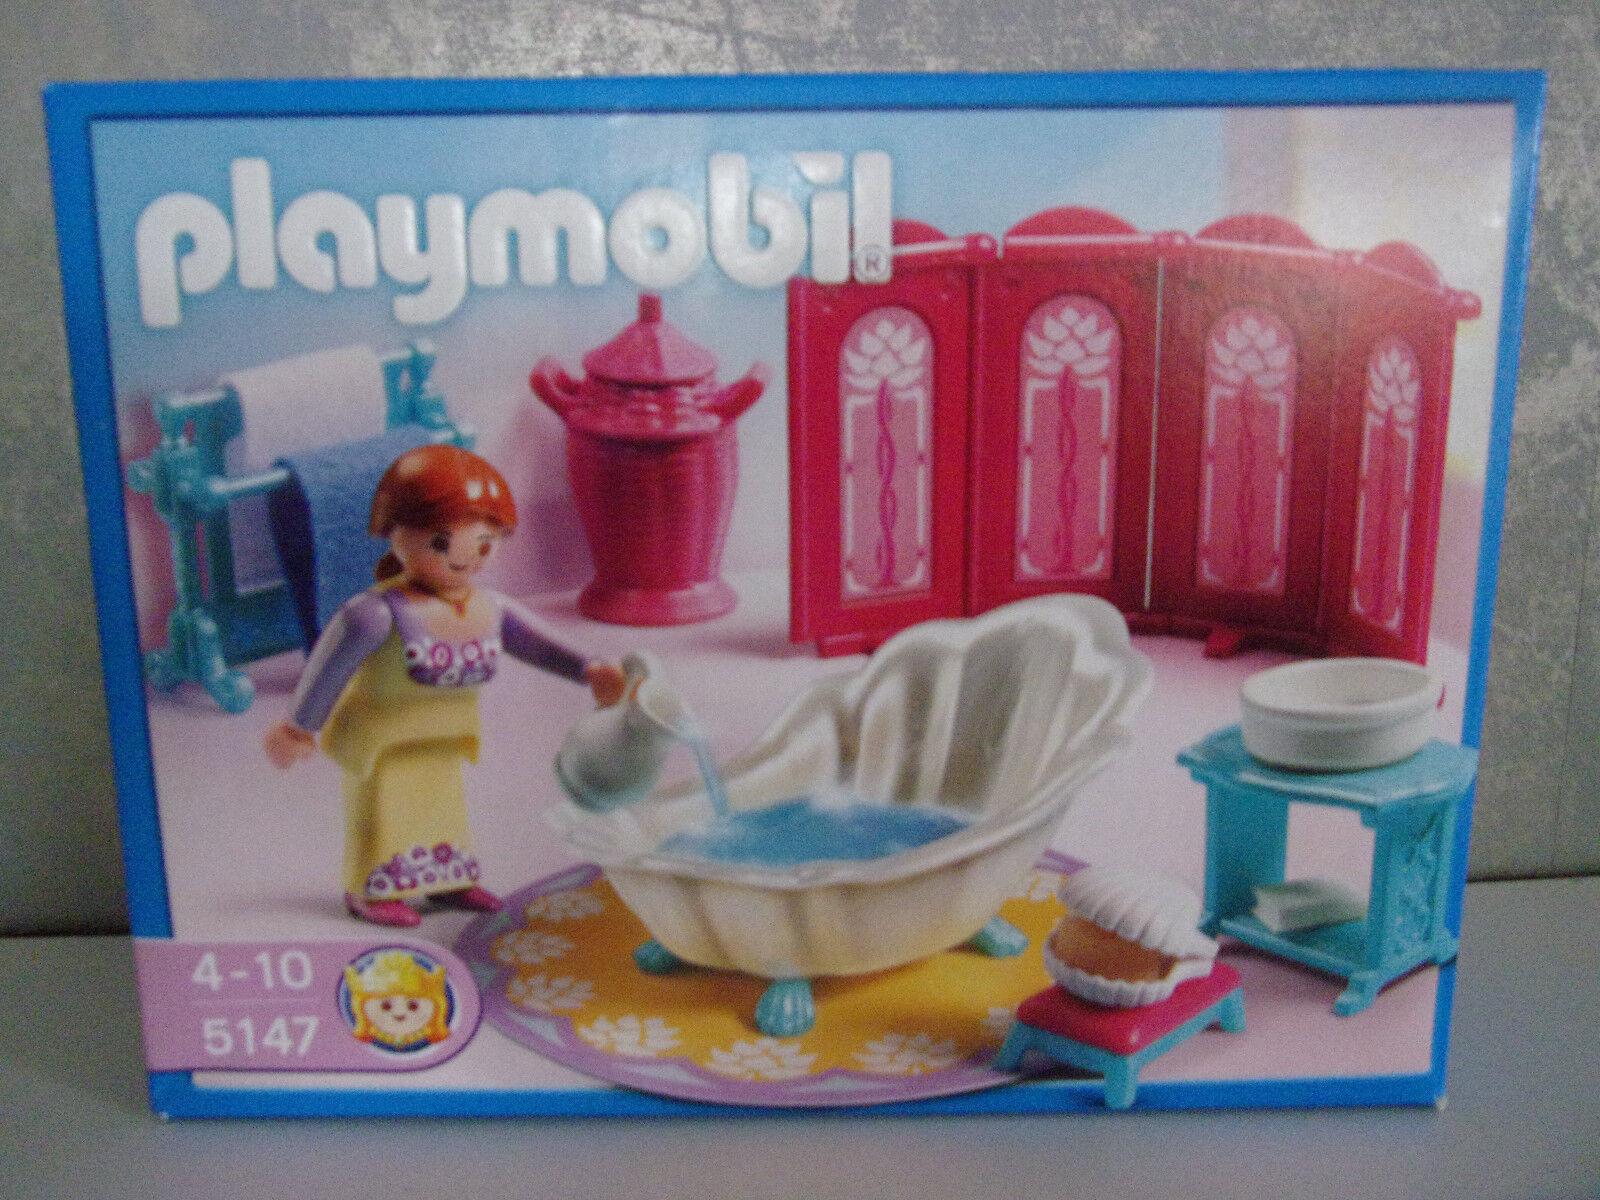 Playmobil 5147 Princess Fantasy Castle Royal Bathroom-New Age 4-10